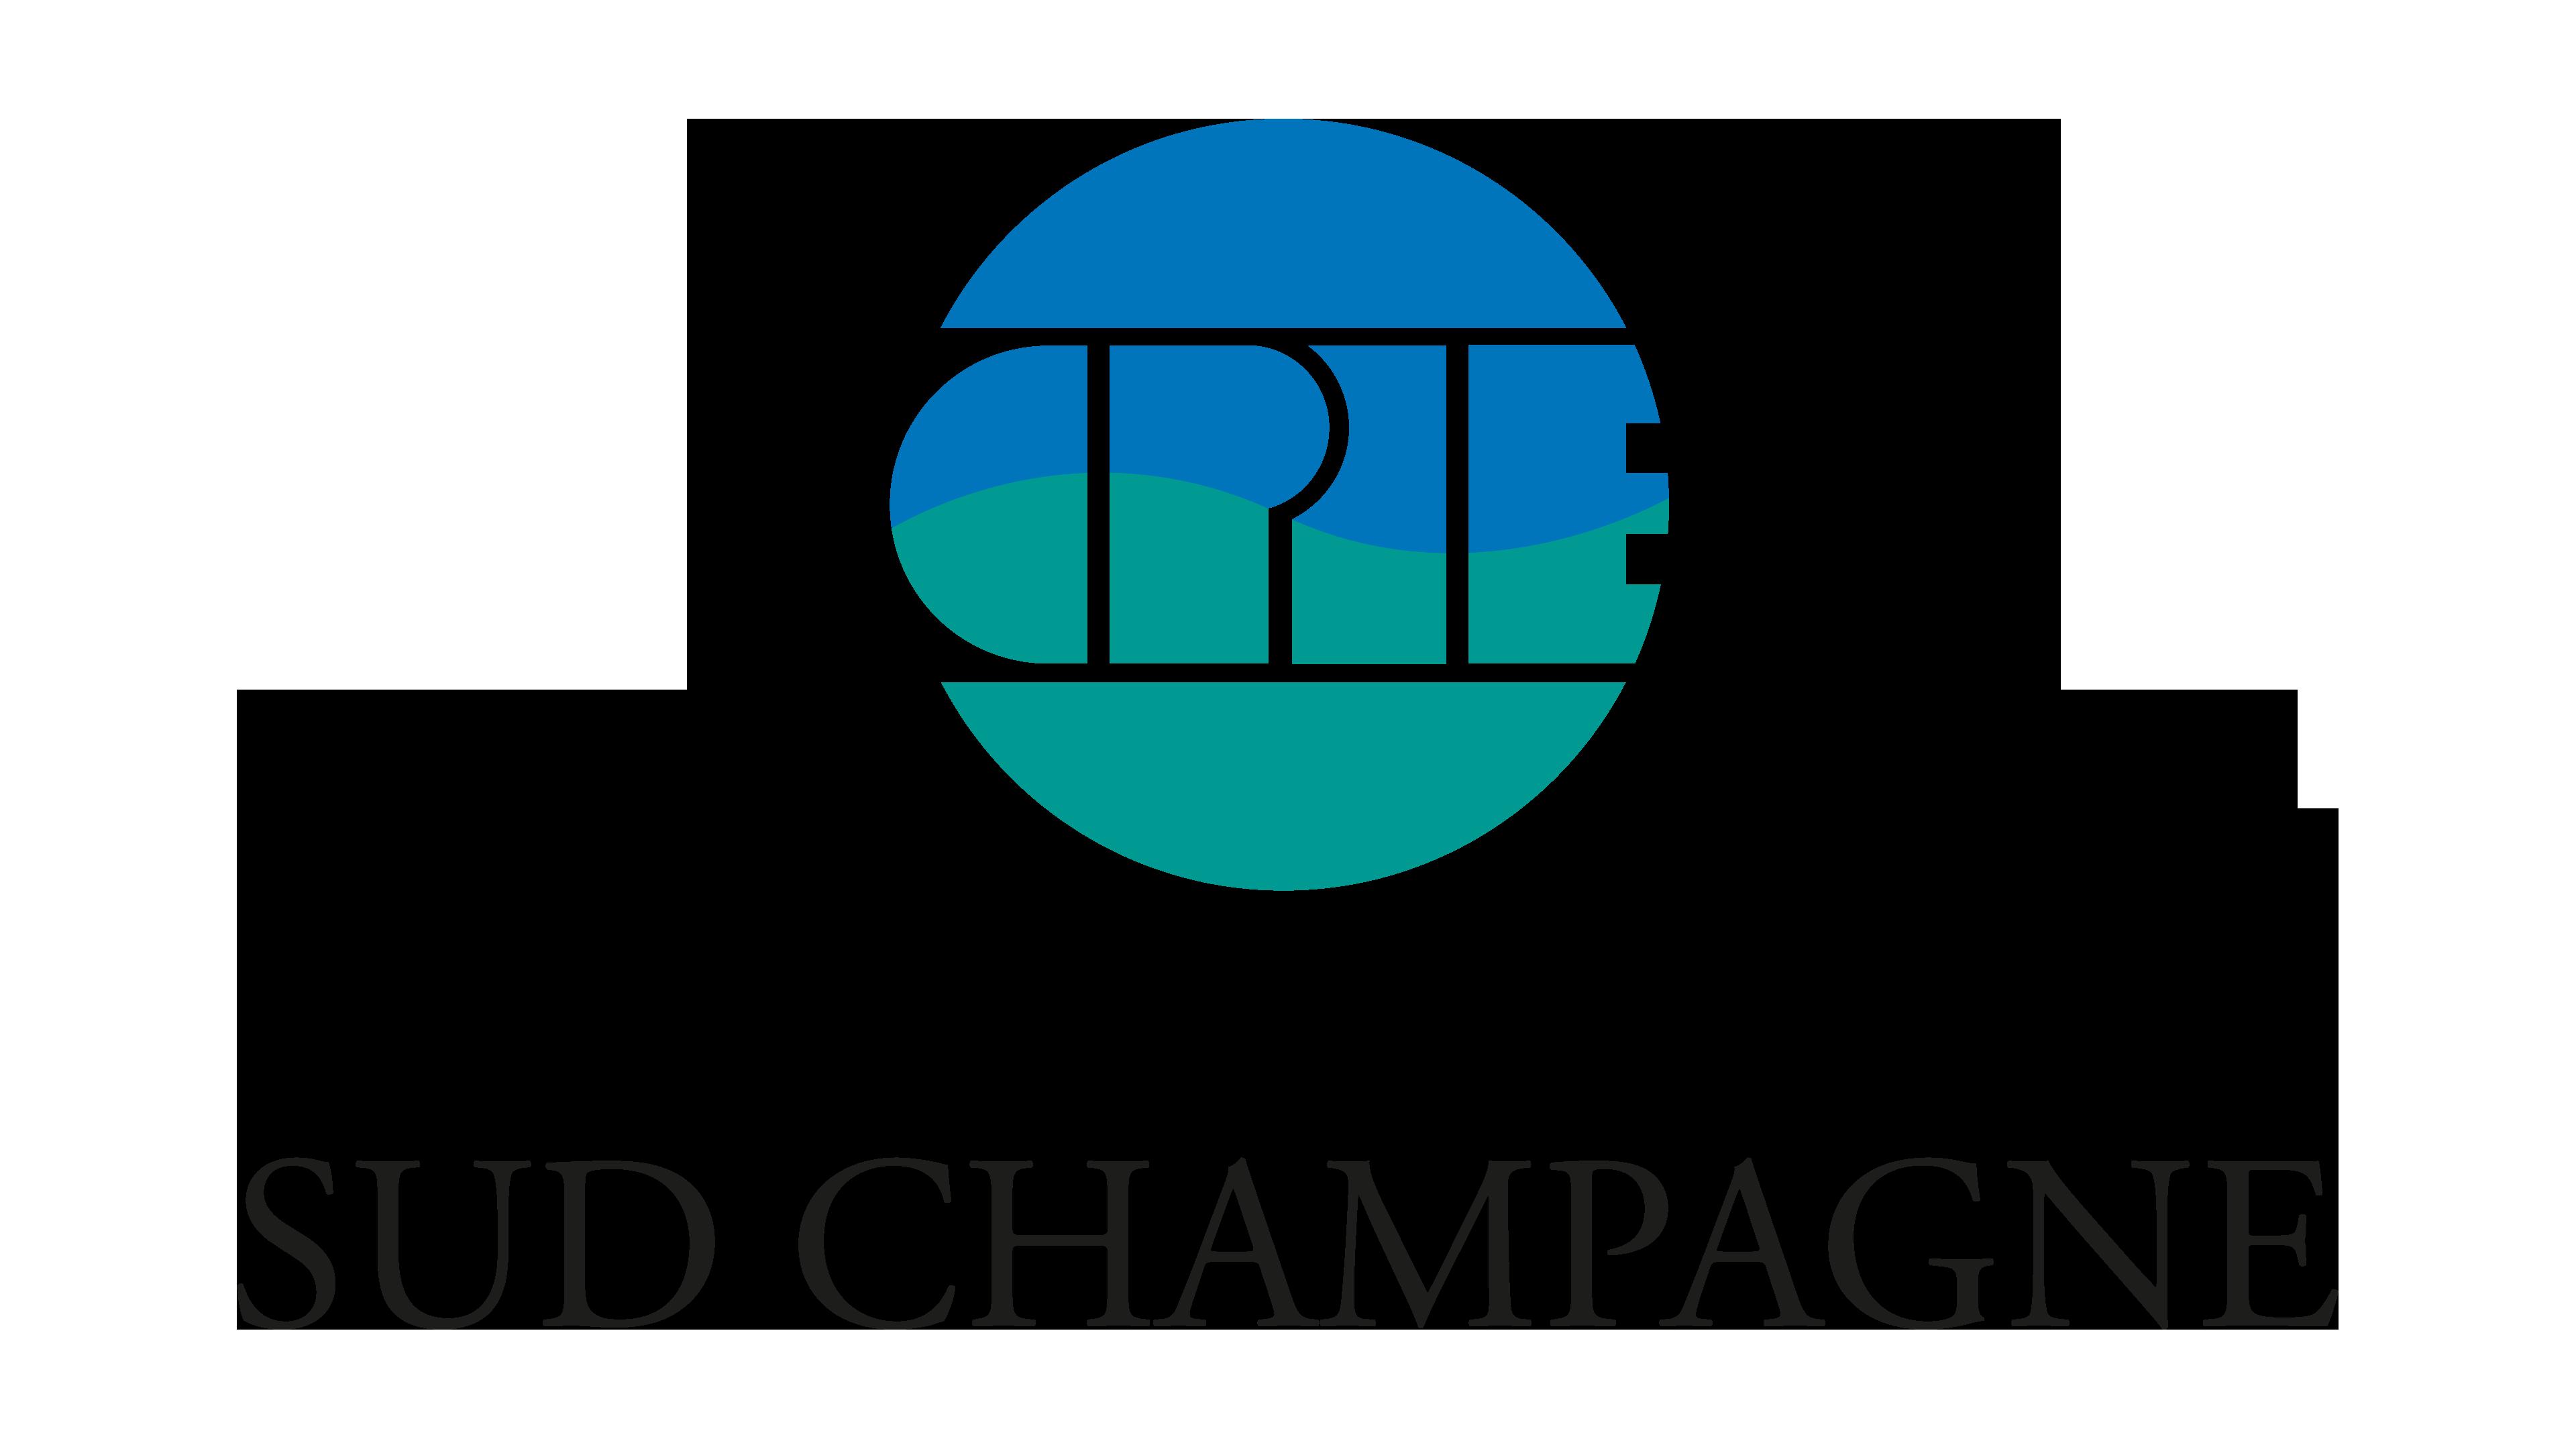 CPIE du Sud Champagne